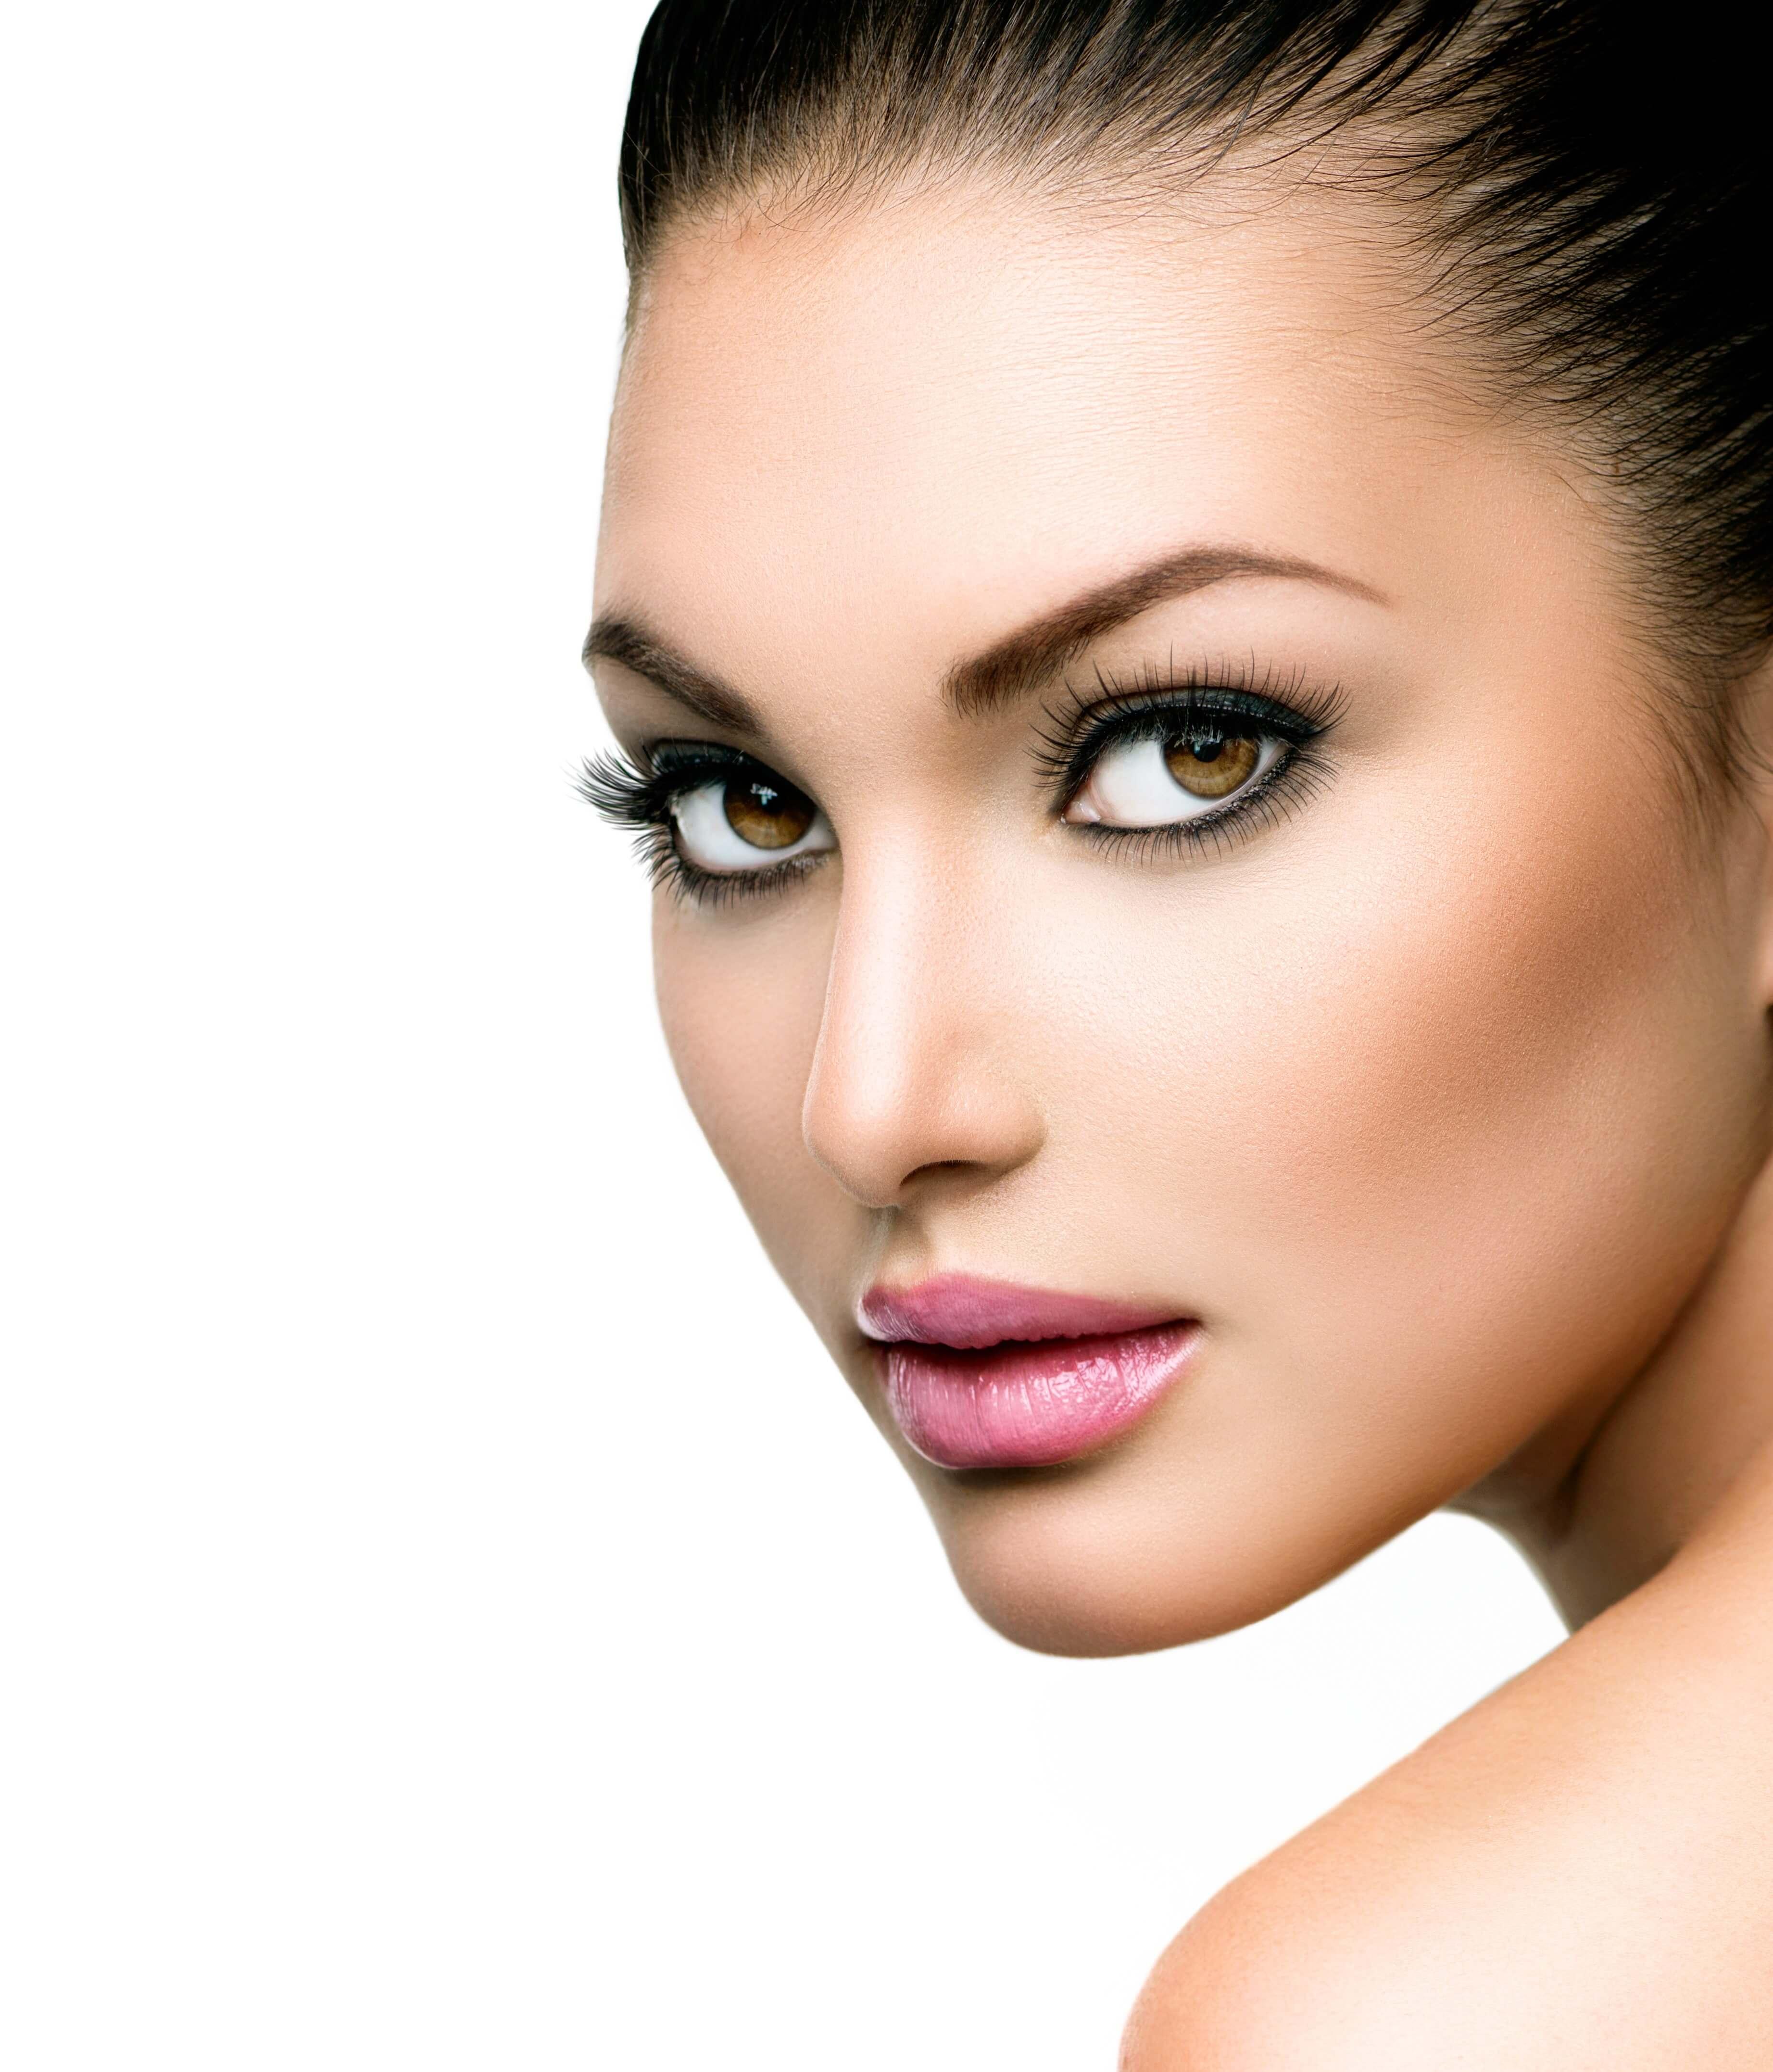 Beauty Basics Bee Stung Lips Botox National Laser